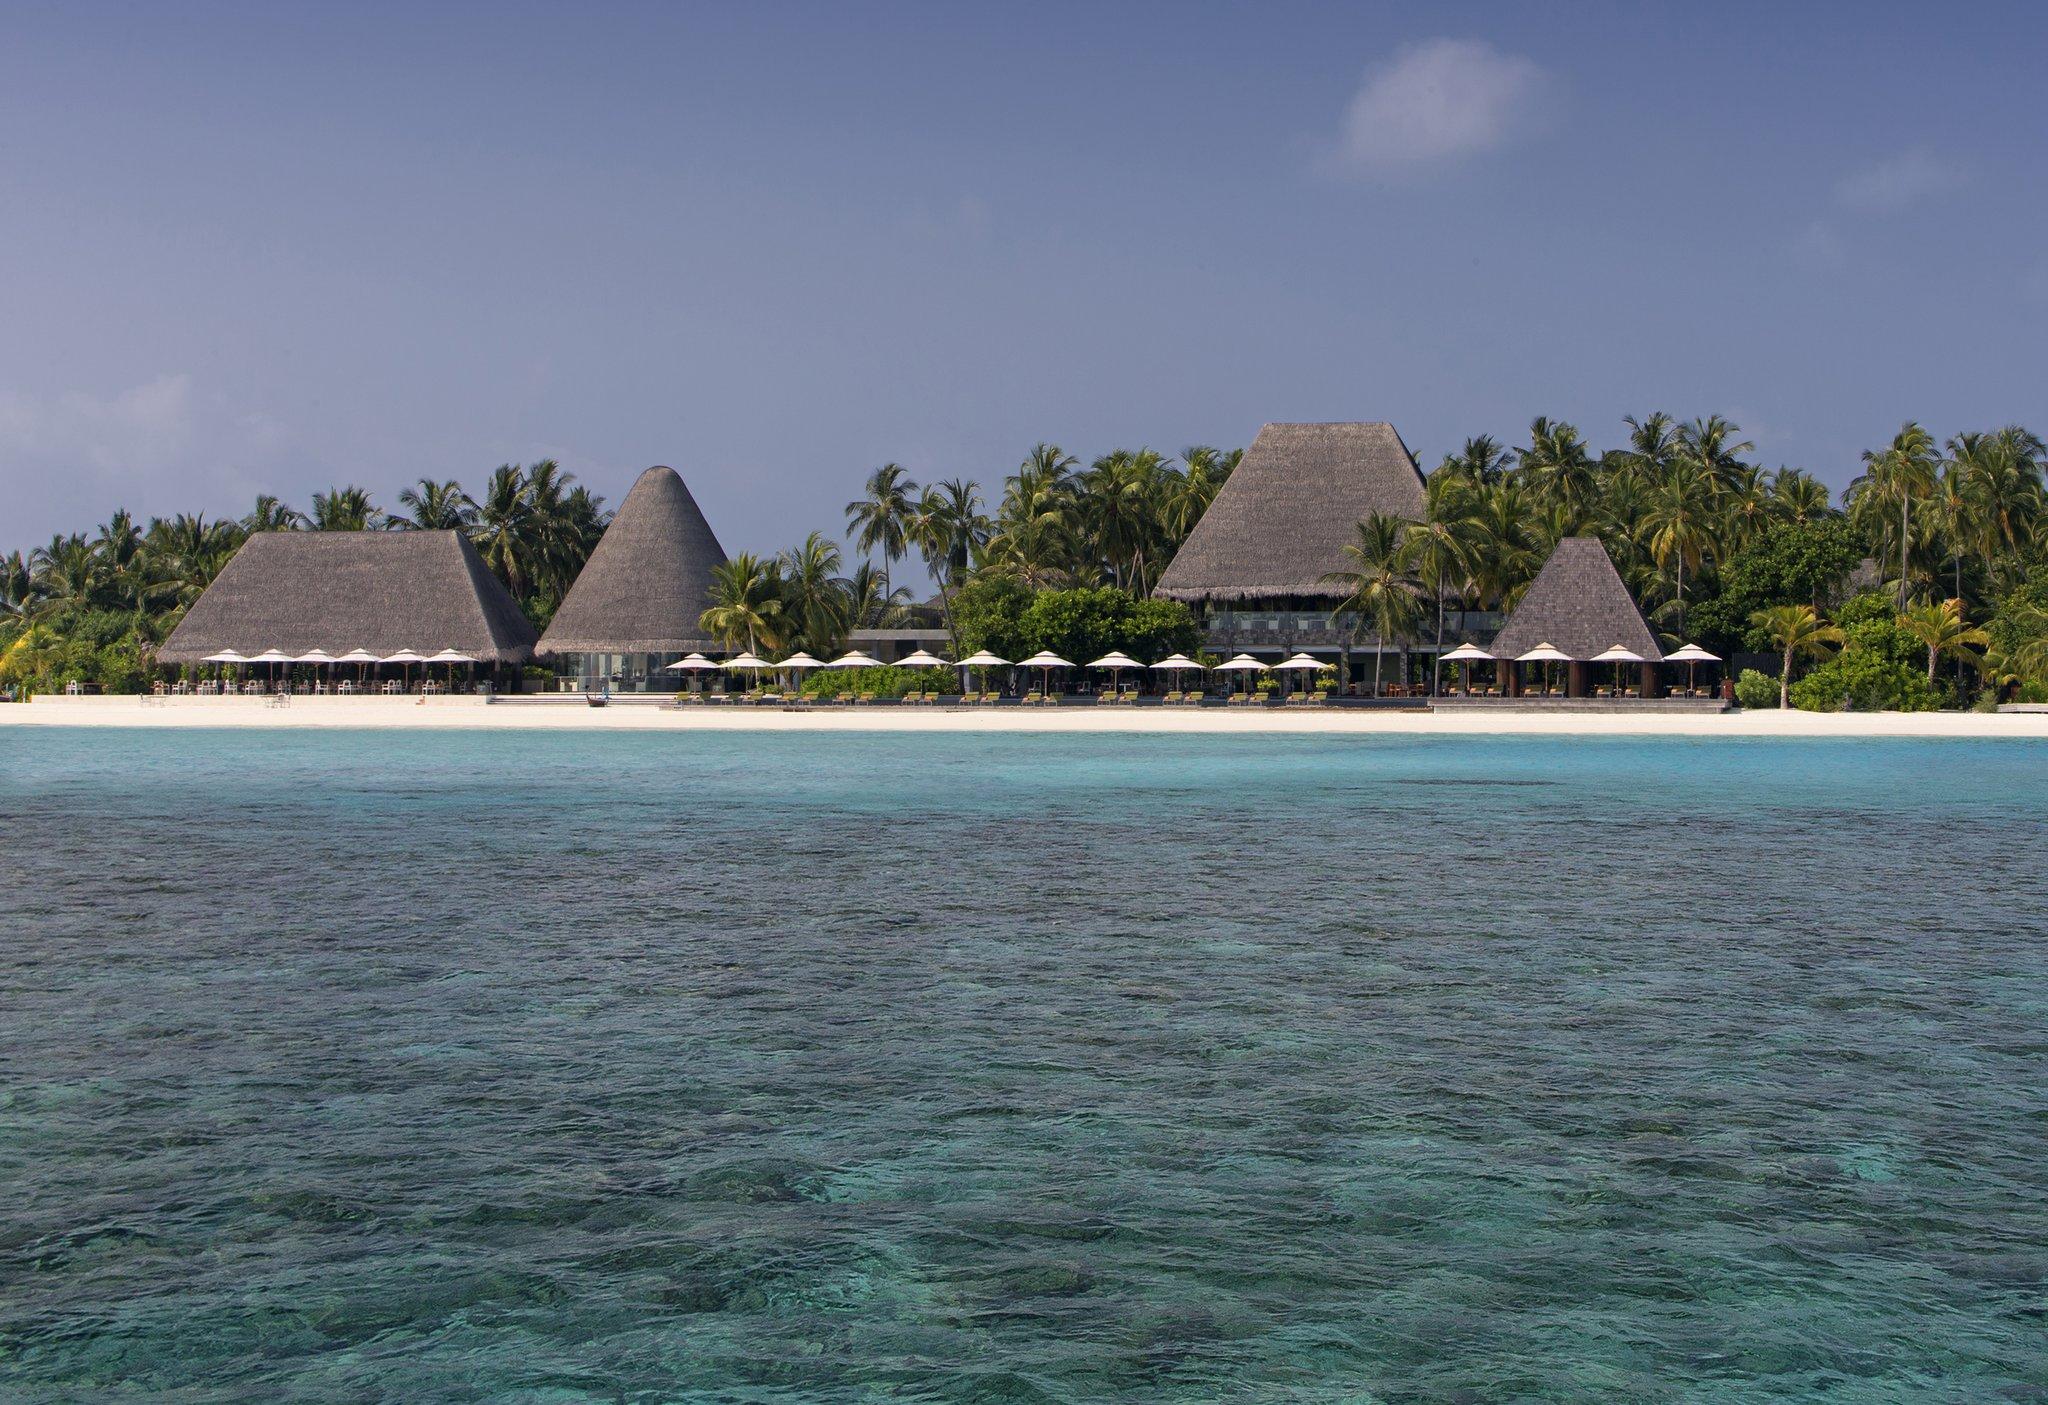 Maldives Anantara Kihavah 15 Villas Manzaru Beachfront view